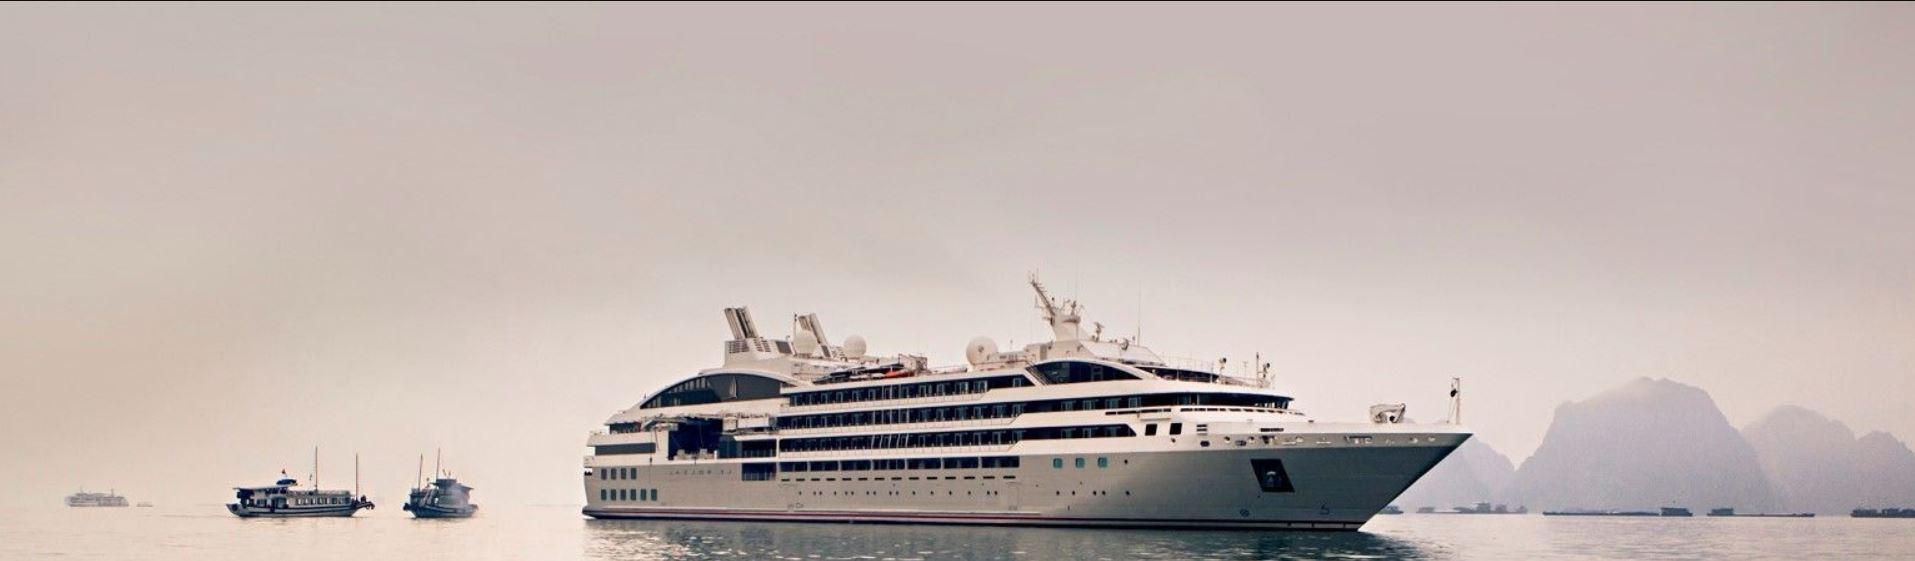 Le Soleal, the ship servicing Emblematic Antarctica 2020 - 2021 (Le Soleal)